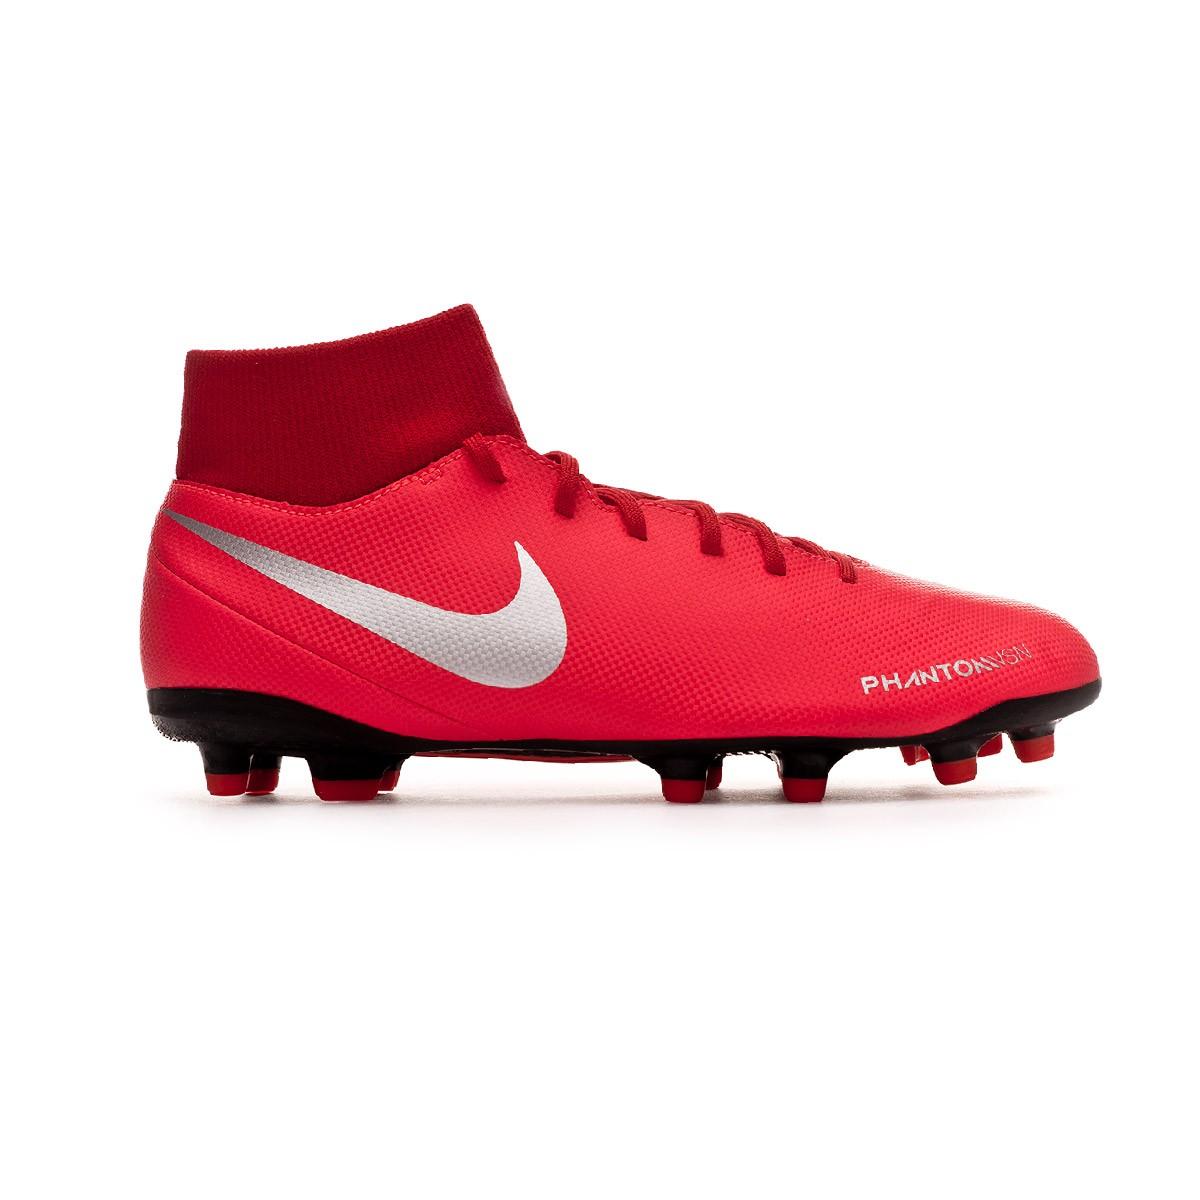 outlet store 9be06 9b14d Boot Nike Phantom Vision Club DF FGMG Bright crimson-Metallic silver -  Football store Fútbol Emotion